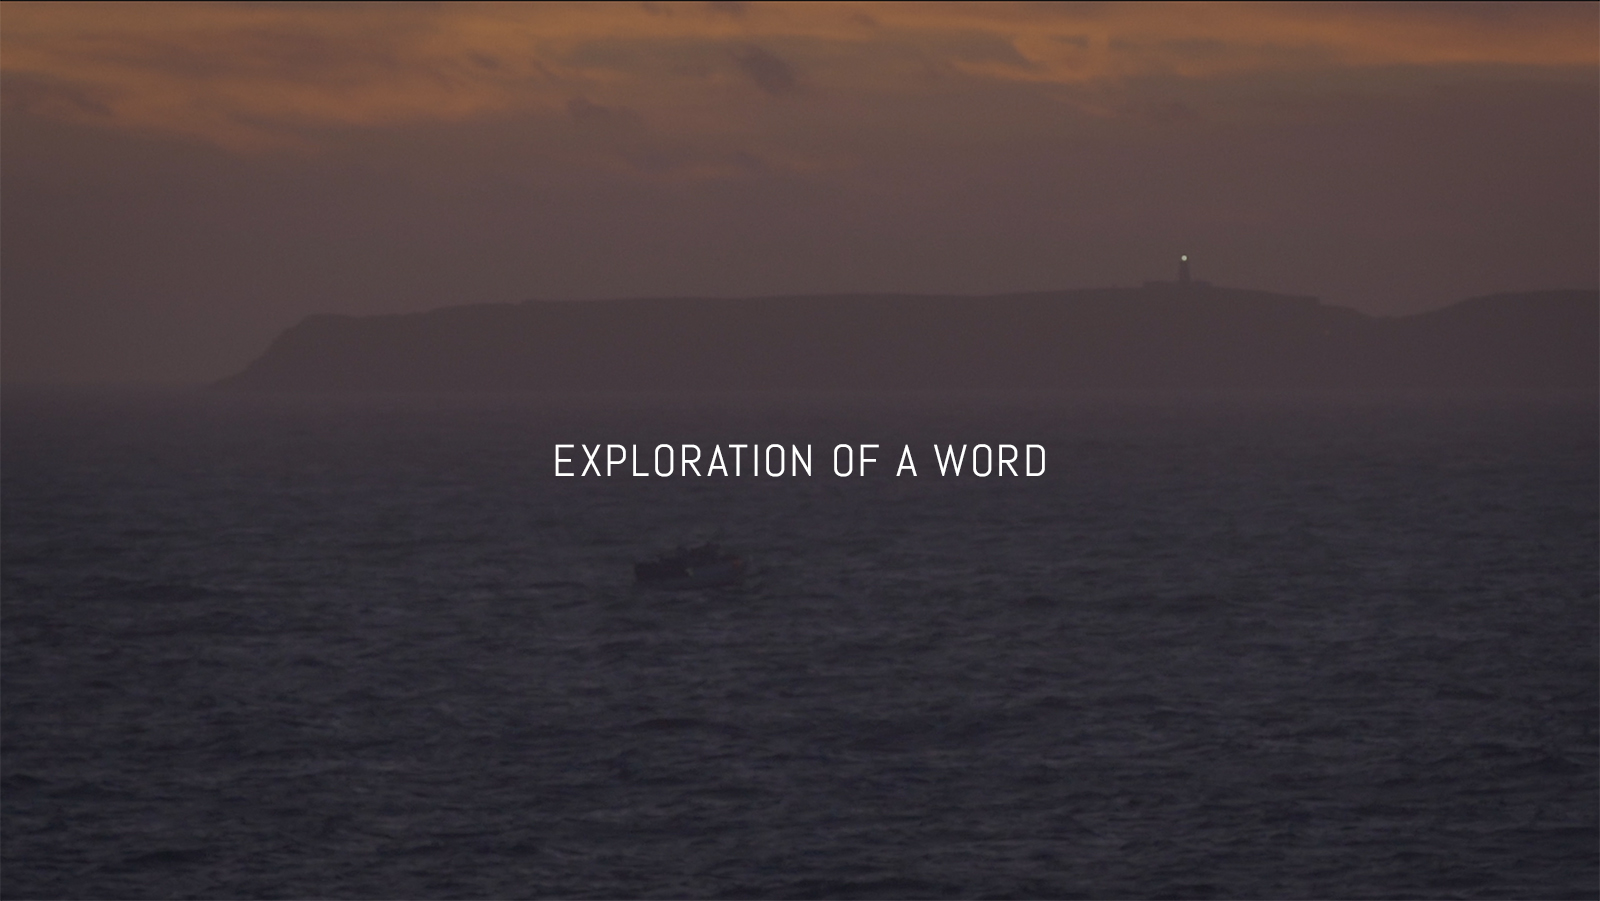 exploratonofaword